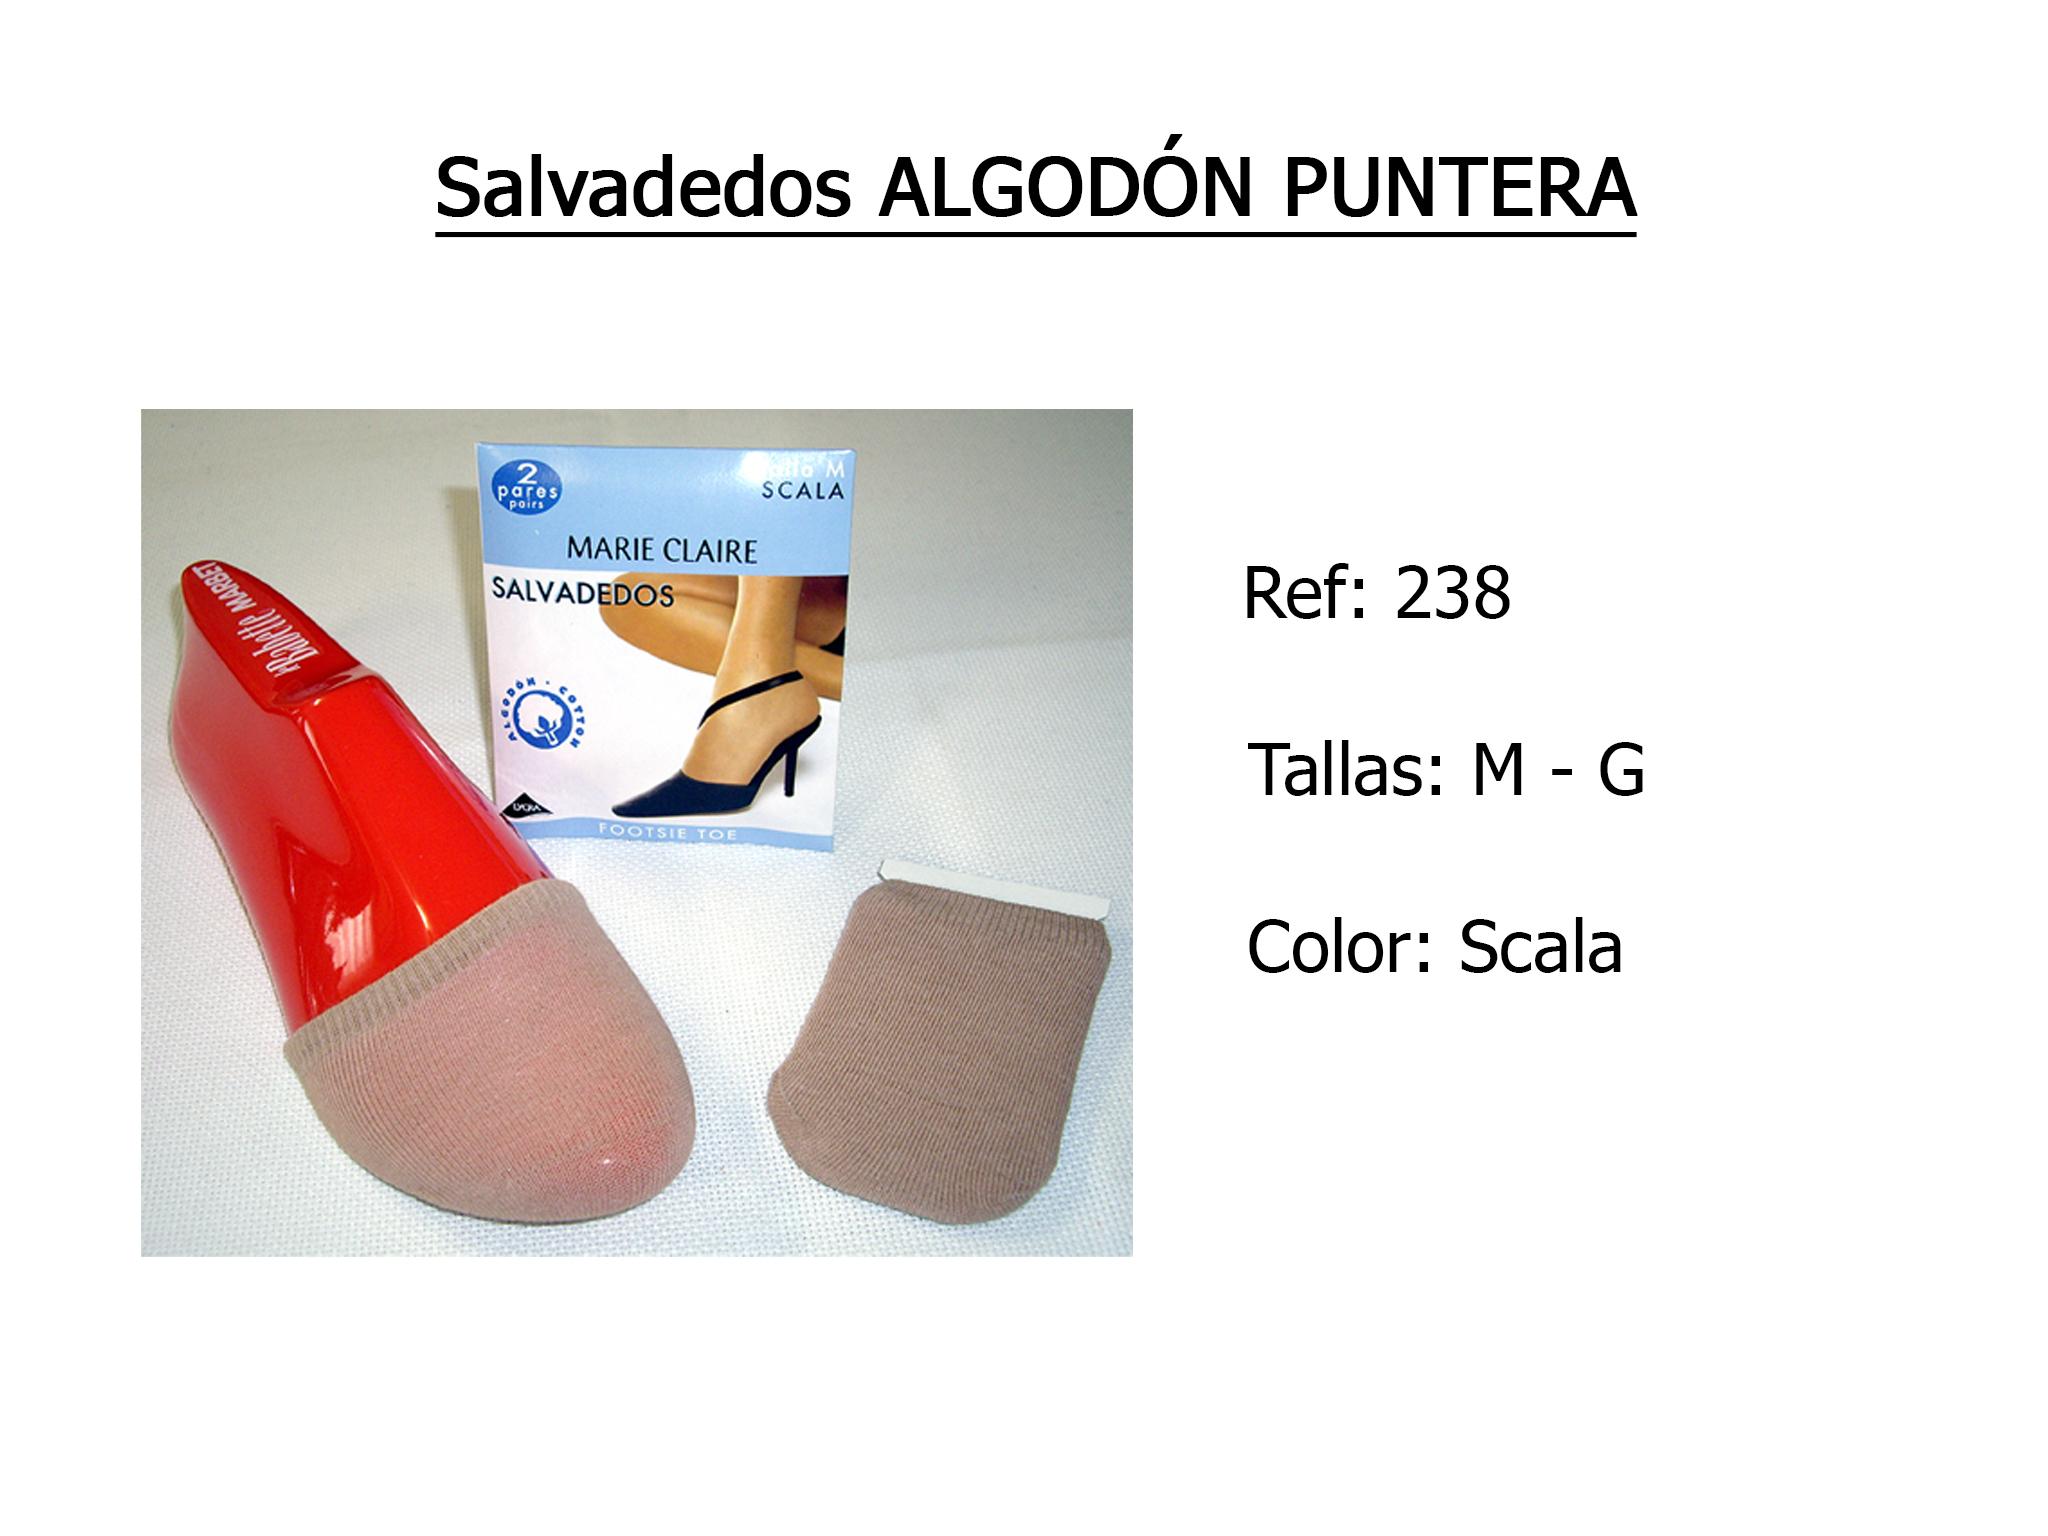 SALVADEDOS algodon puntera 238